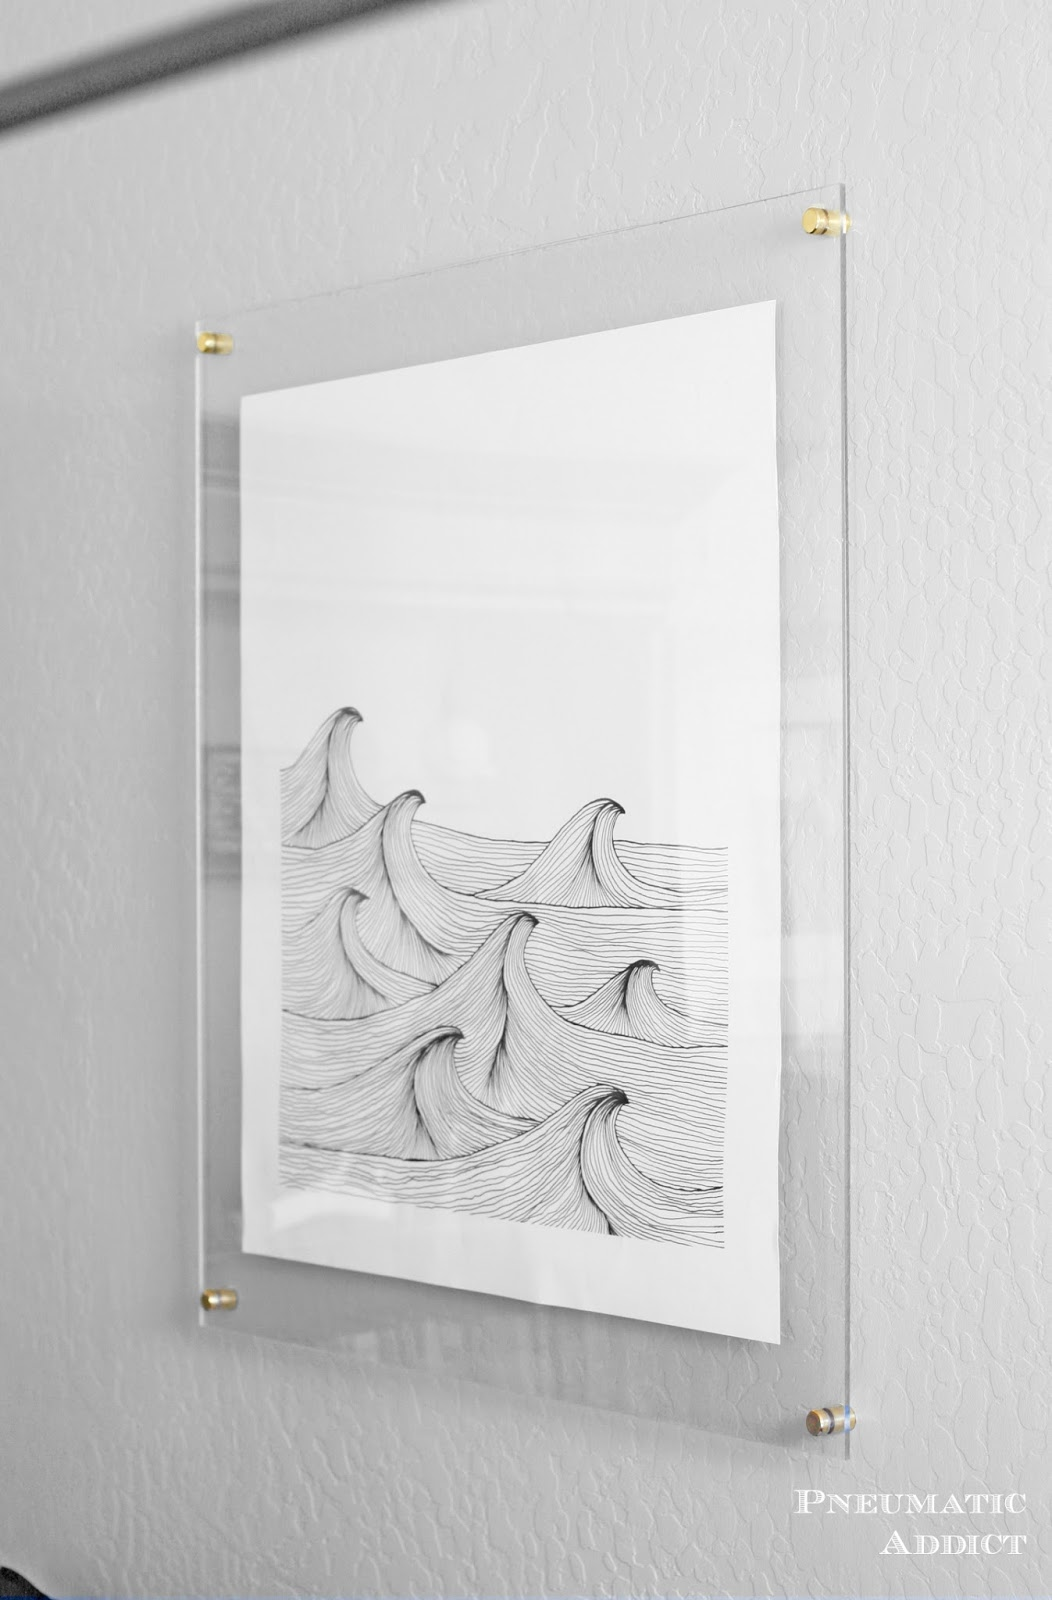 Pneumatic addict frameless floating art tutorial solutioingenieria Gallery